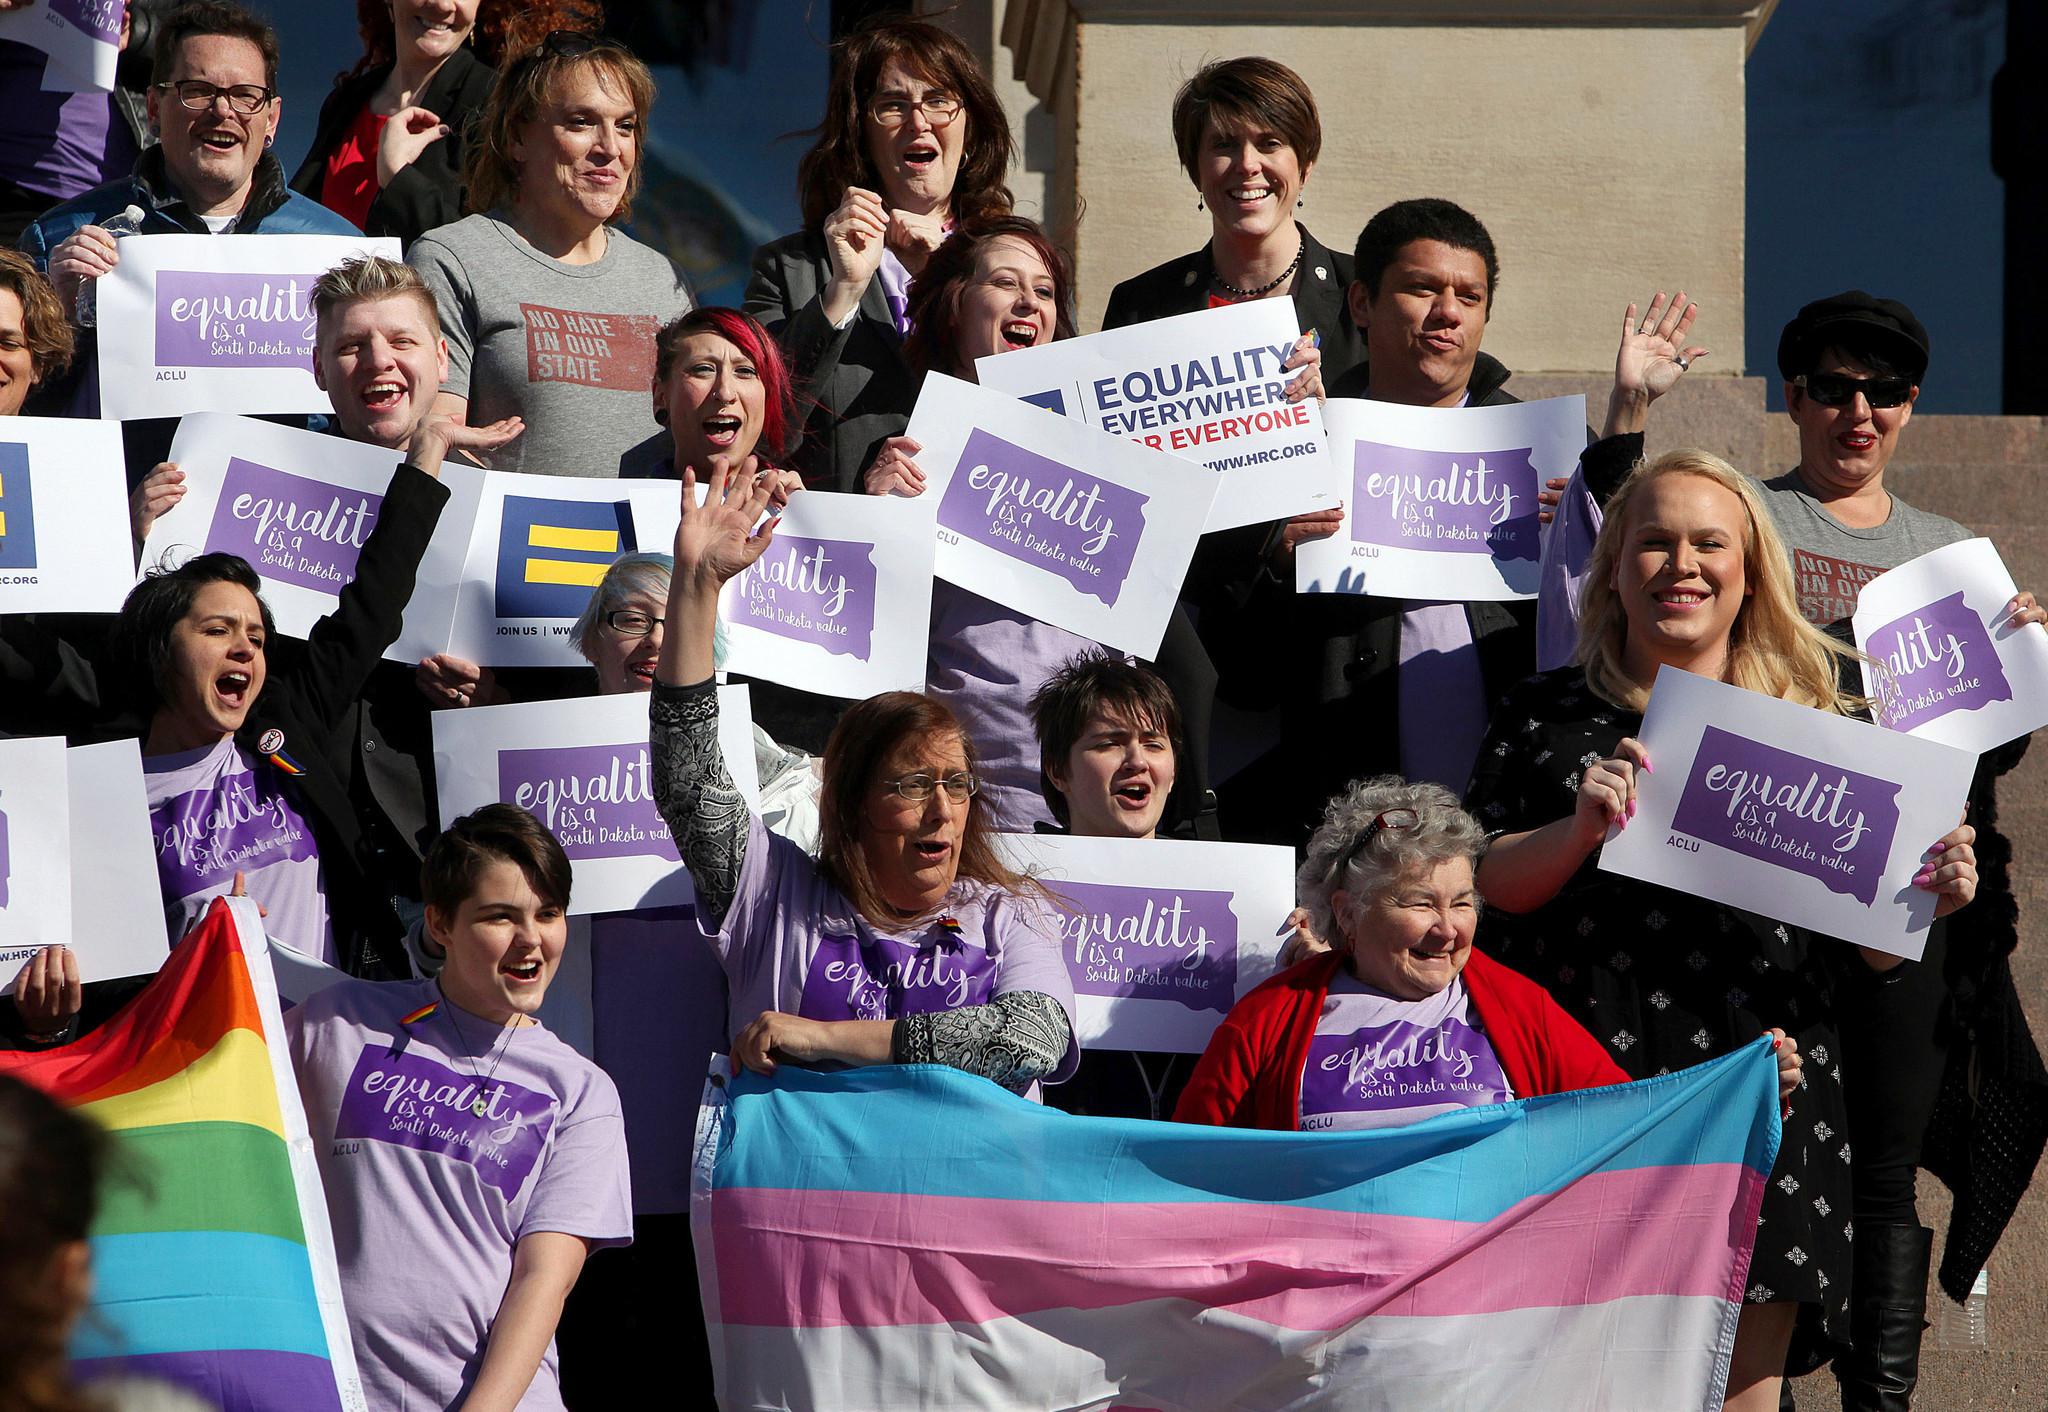 South Dakota governor vetoes transgender bathroom bill saying it